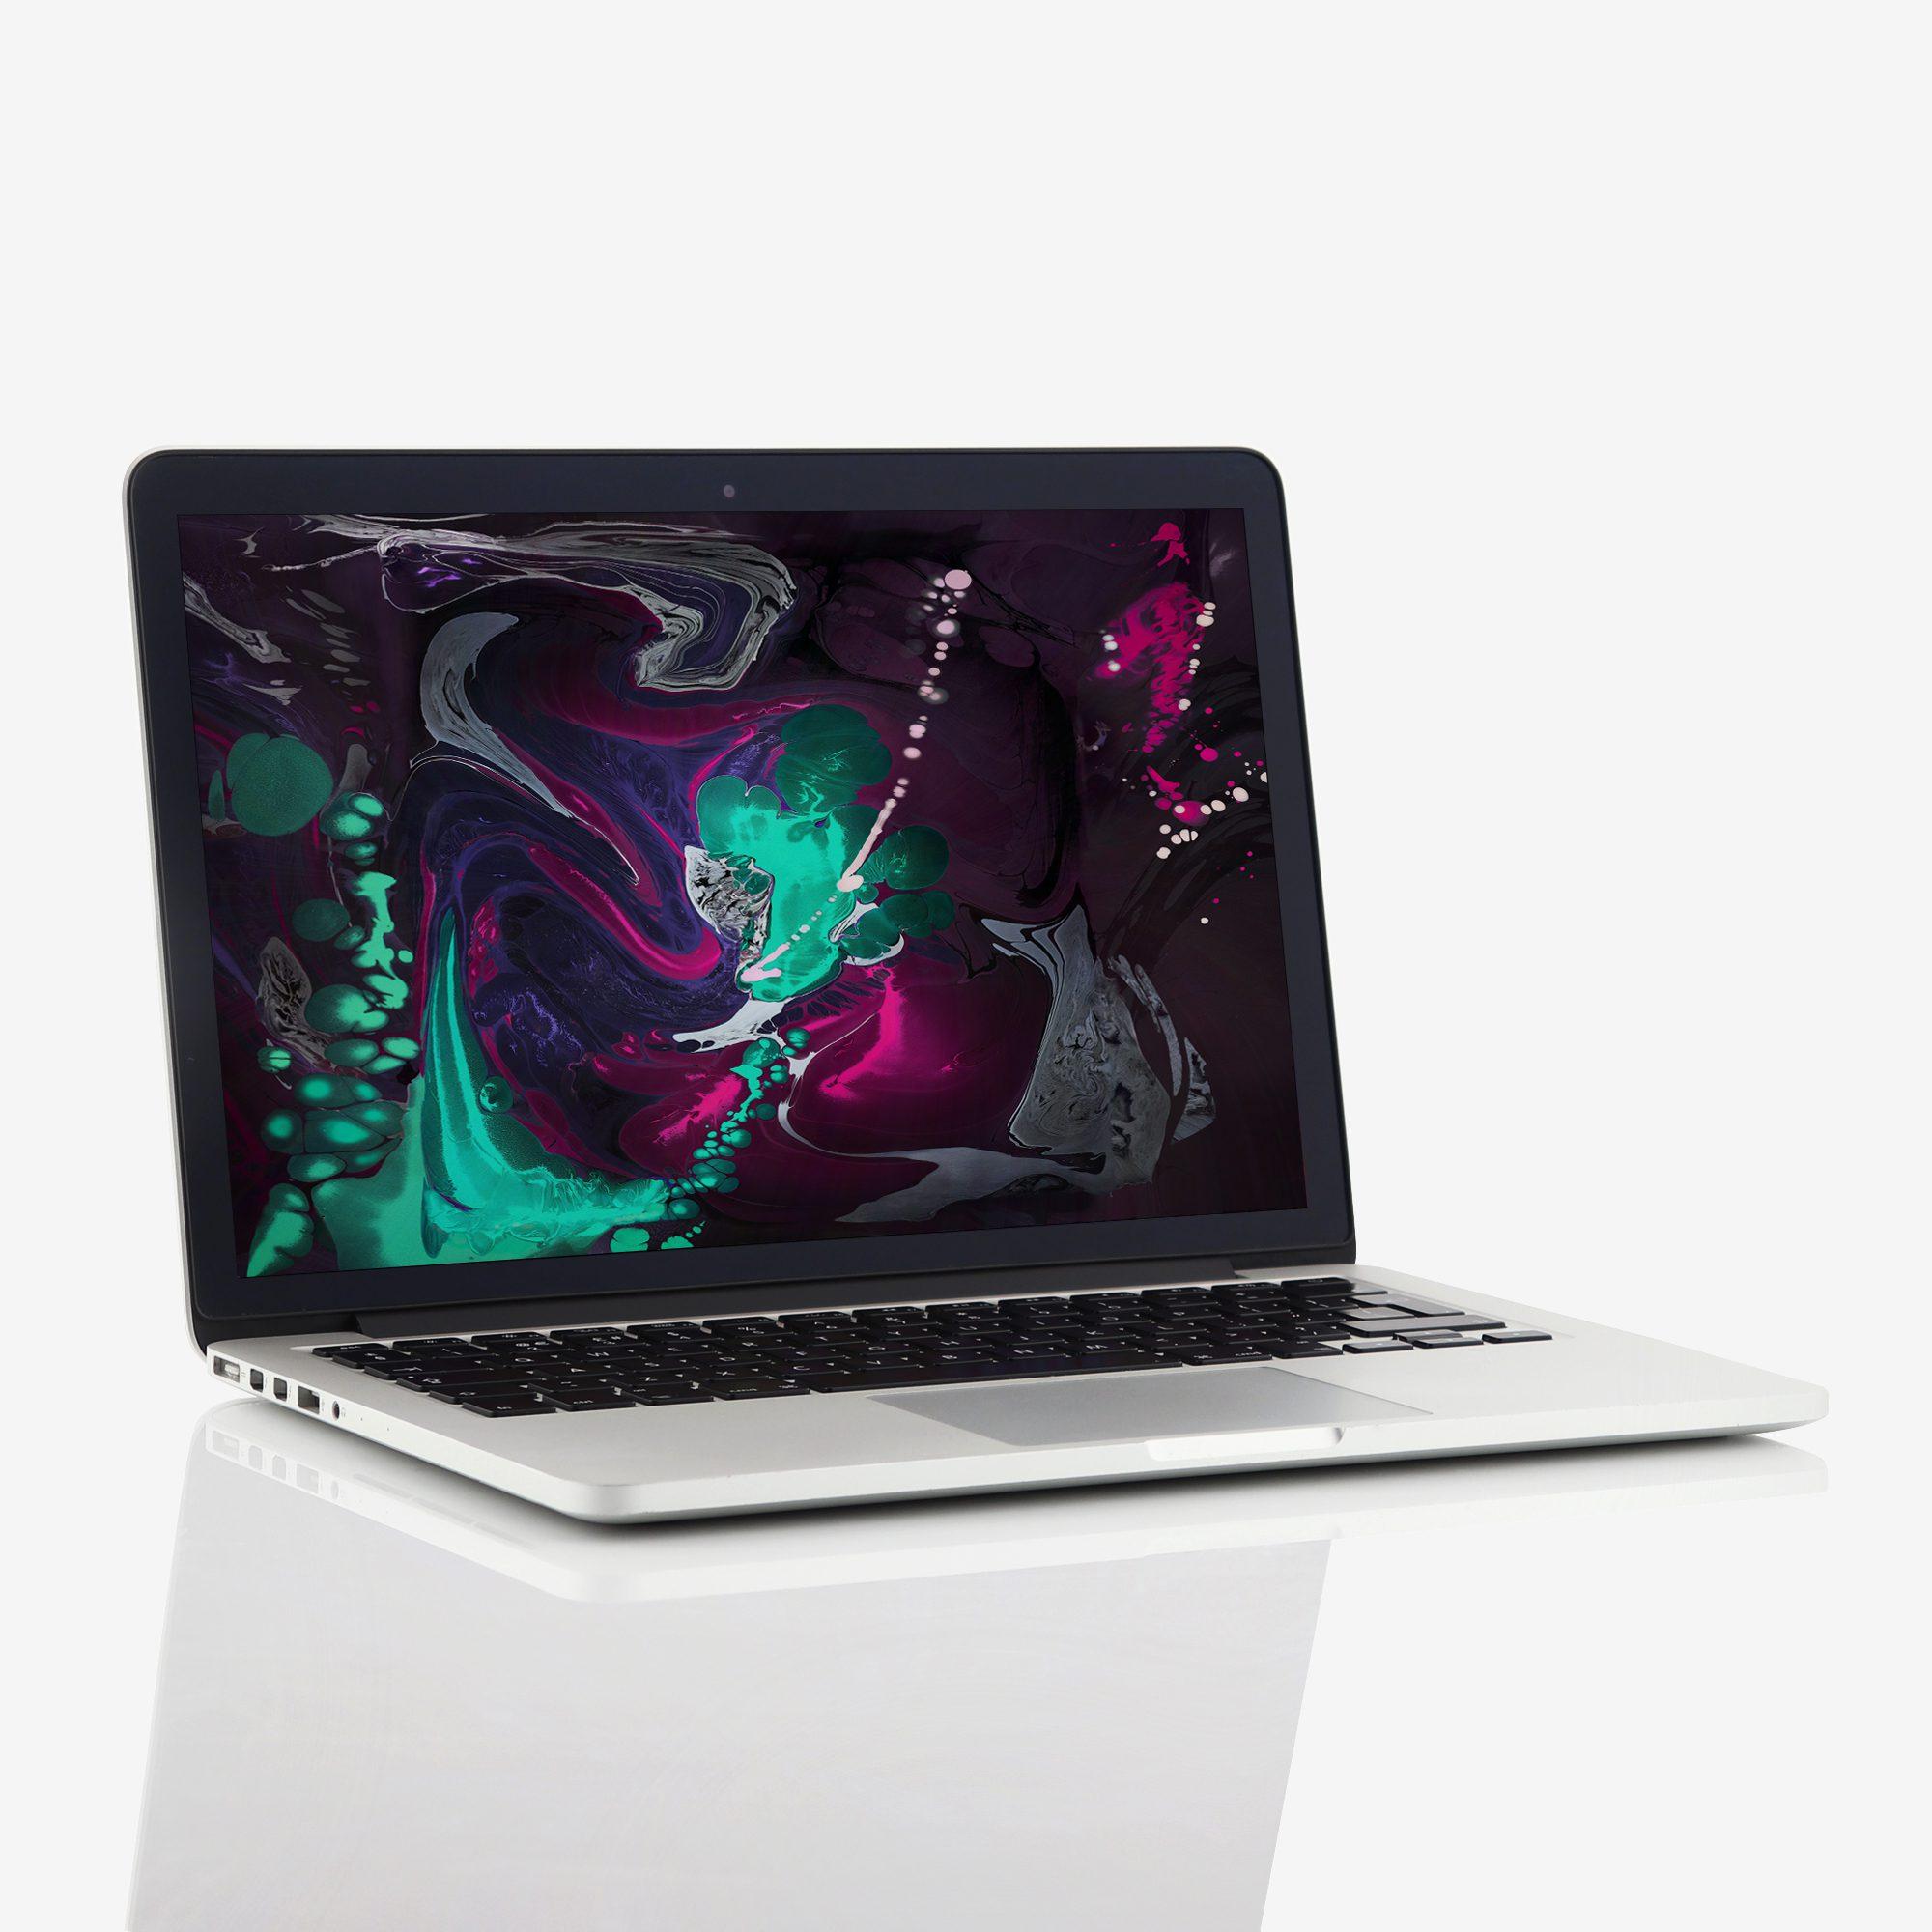 1 x Apple MacBook Pro Retina 13 Inch Intel Core i5 2.80 GHz (2014)